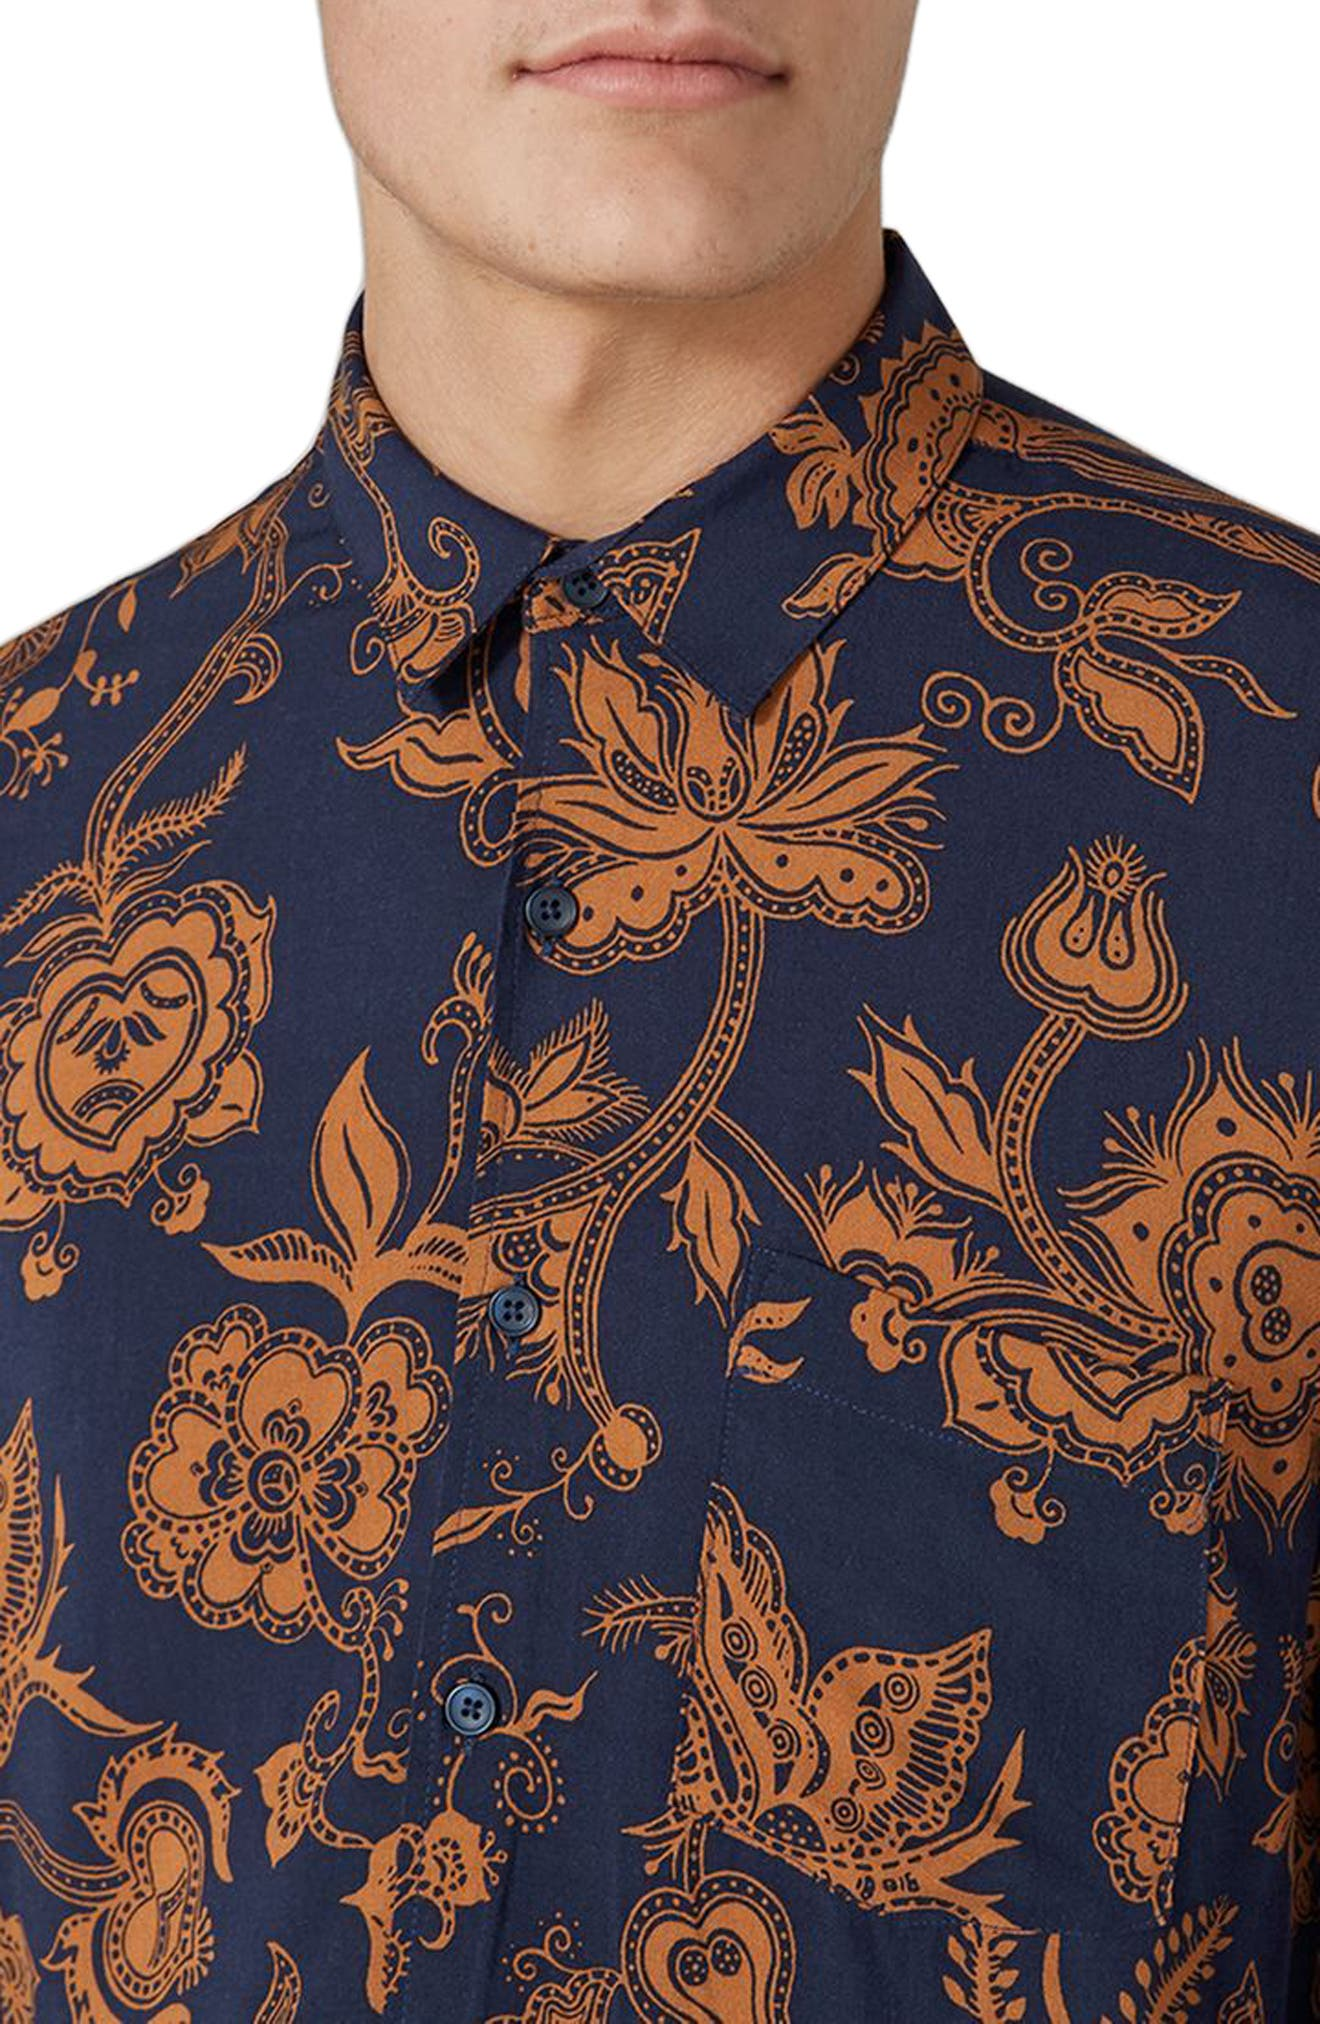 Classic Fit Floral Print Shirt,                             Alternate thumbnail 3, color,                             410